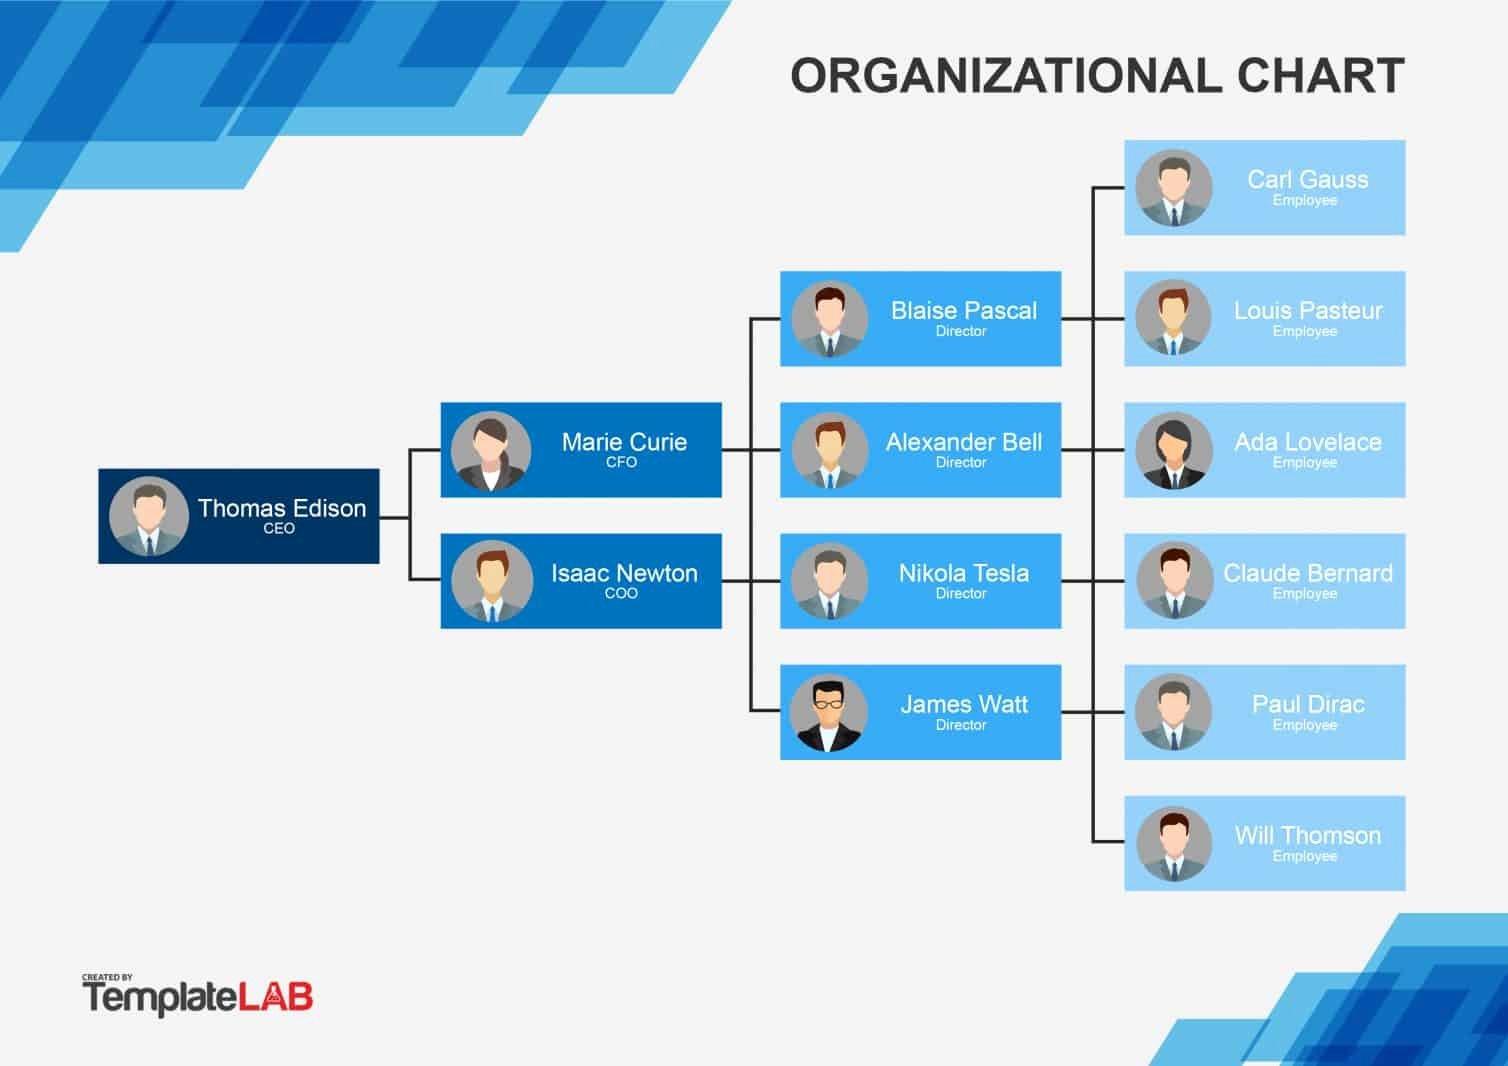 Word organization Chart Template Fresh 40 organizational Chart Templates Word Excel Powerpoint